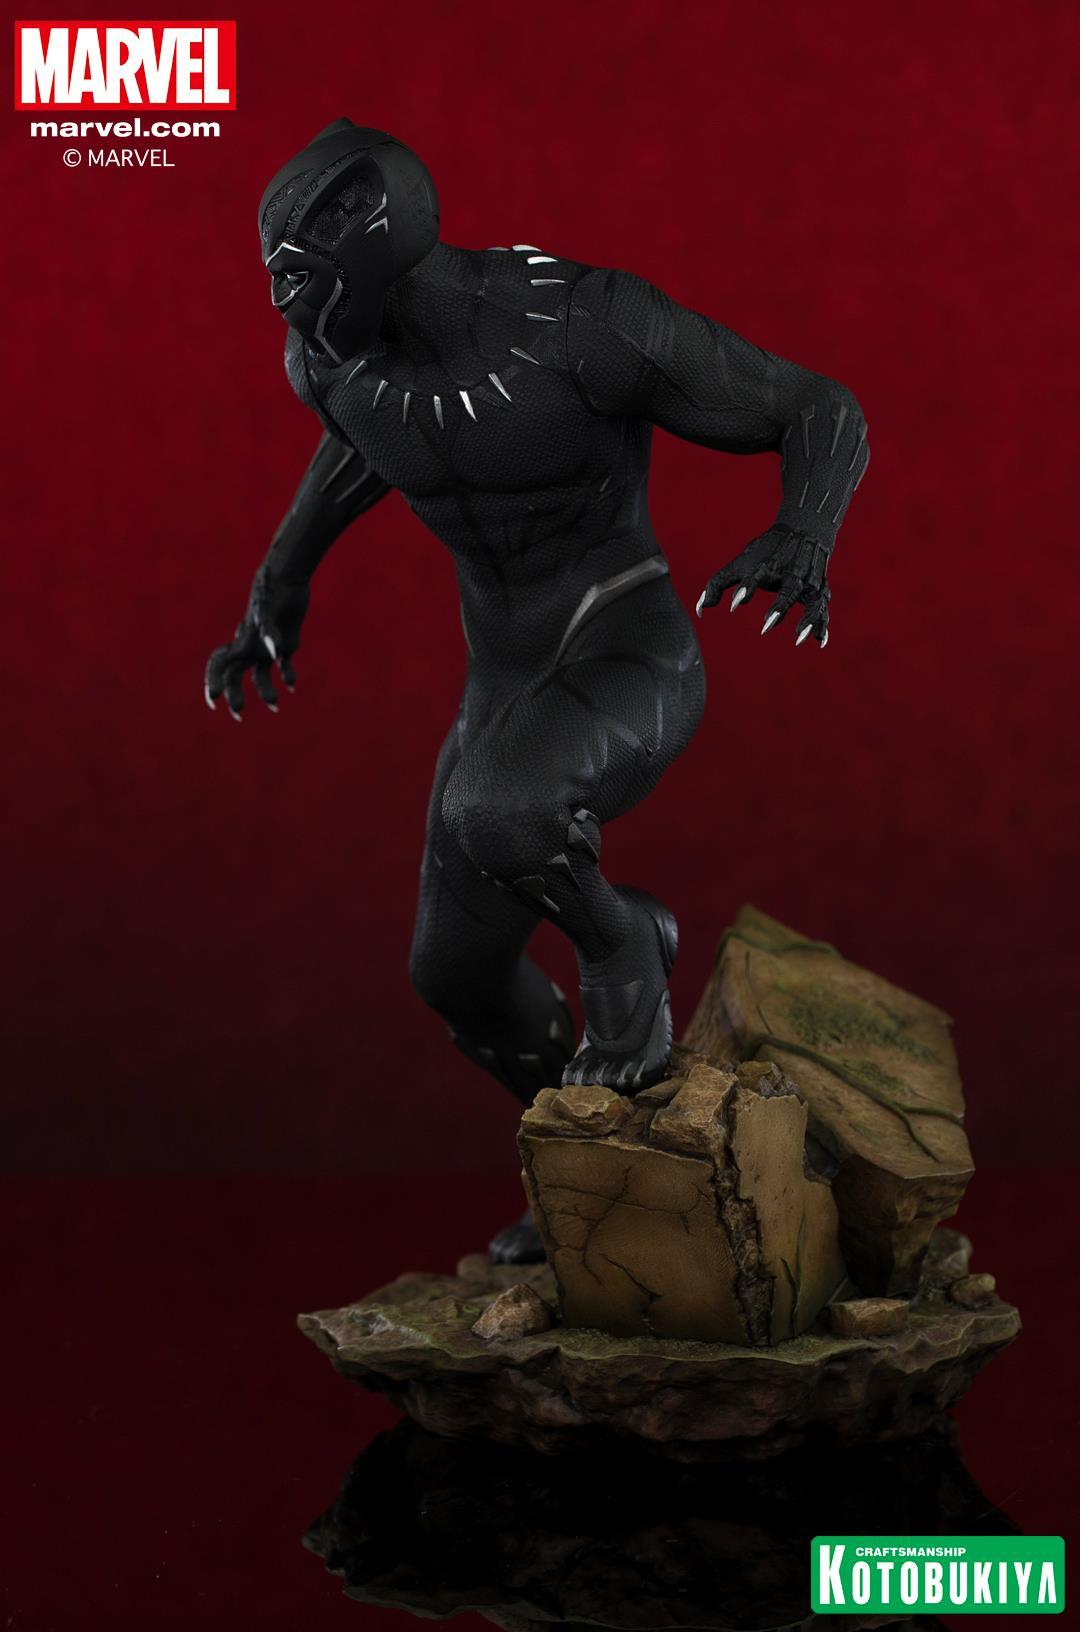 Koto-Black-Panther-Movie-Statue-006